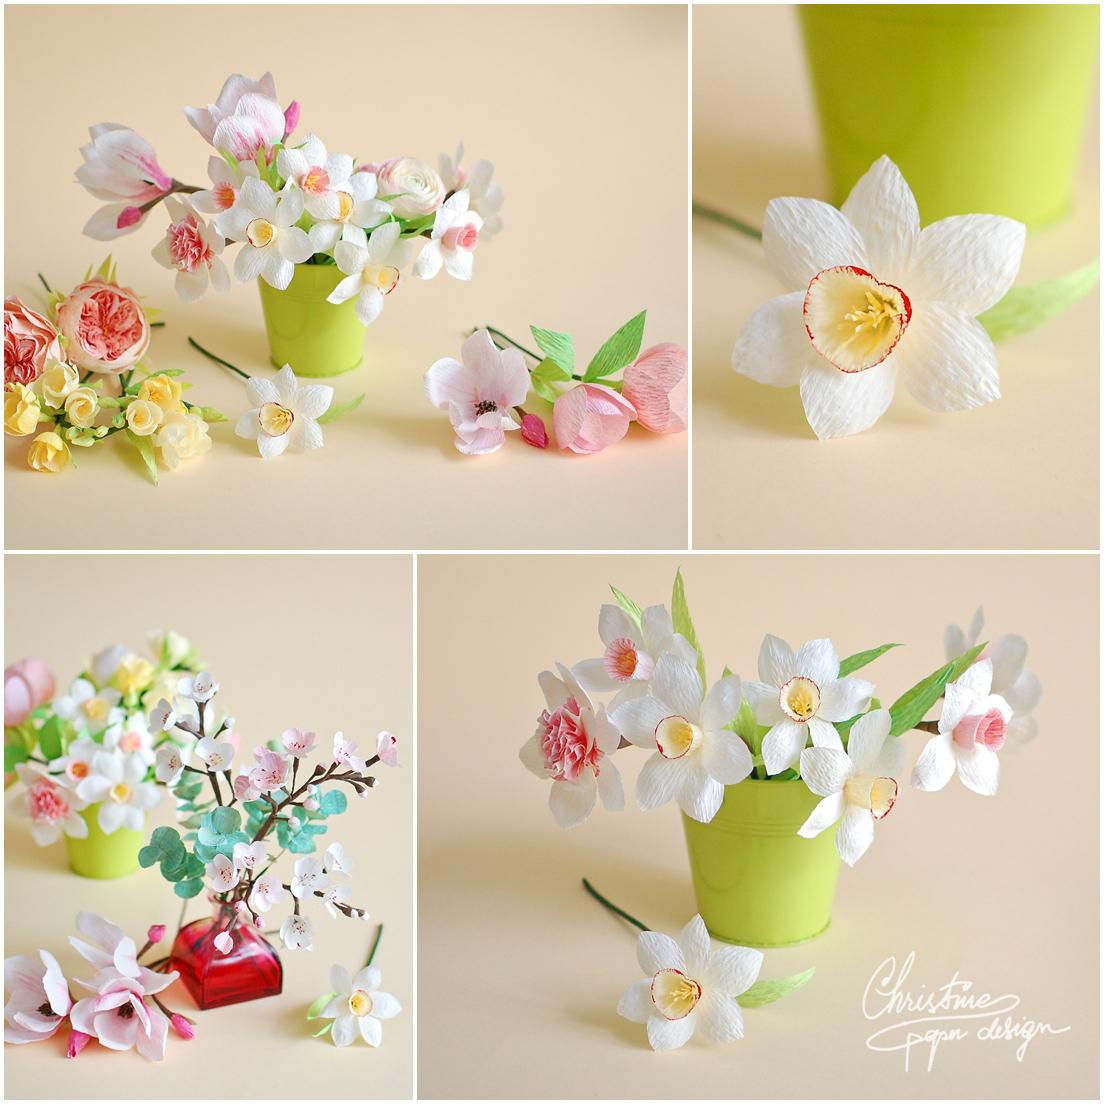 Christine paper design - spring paper flowers (6)